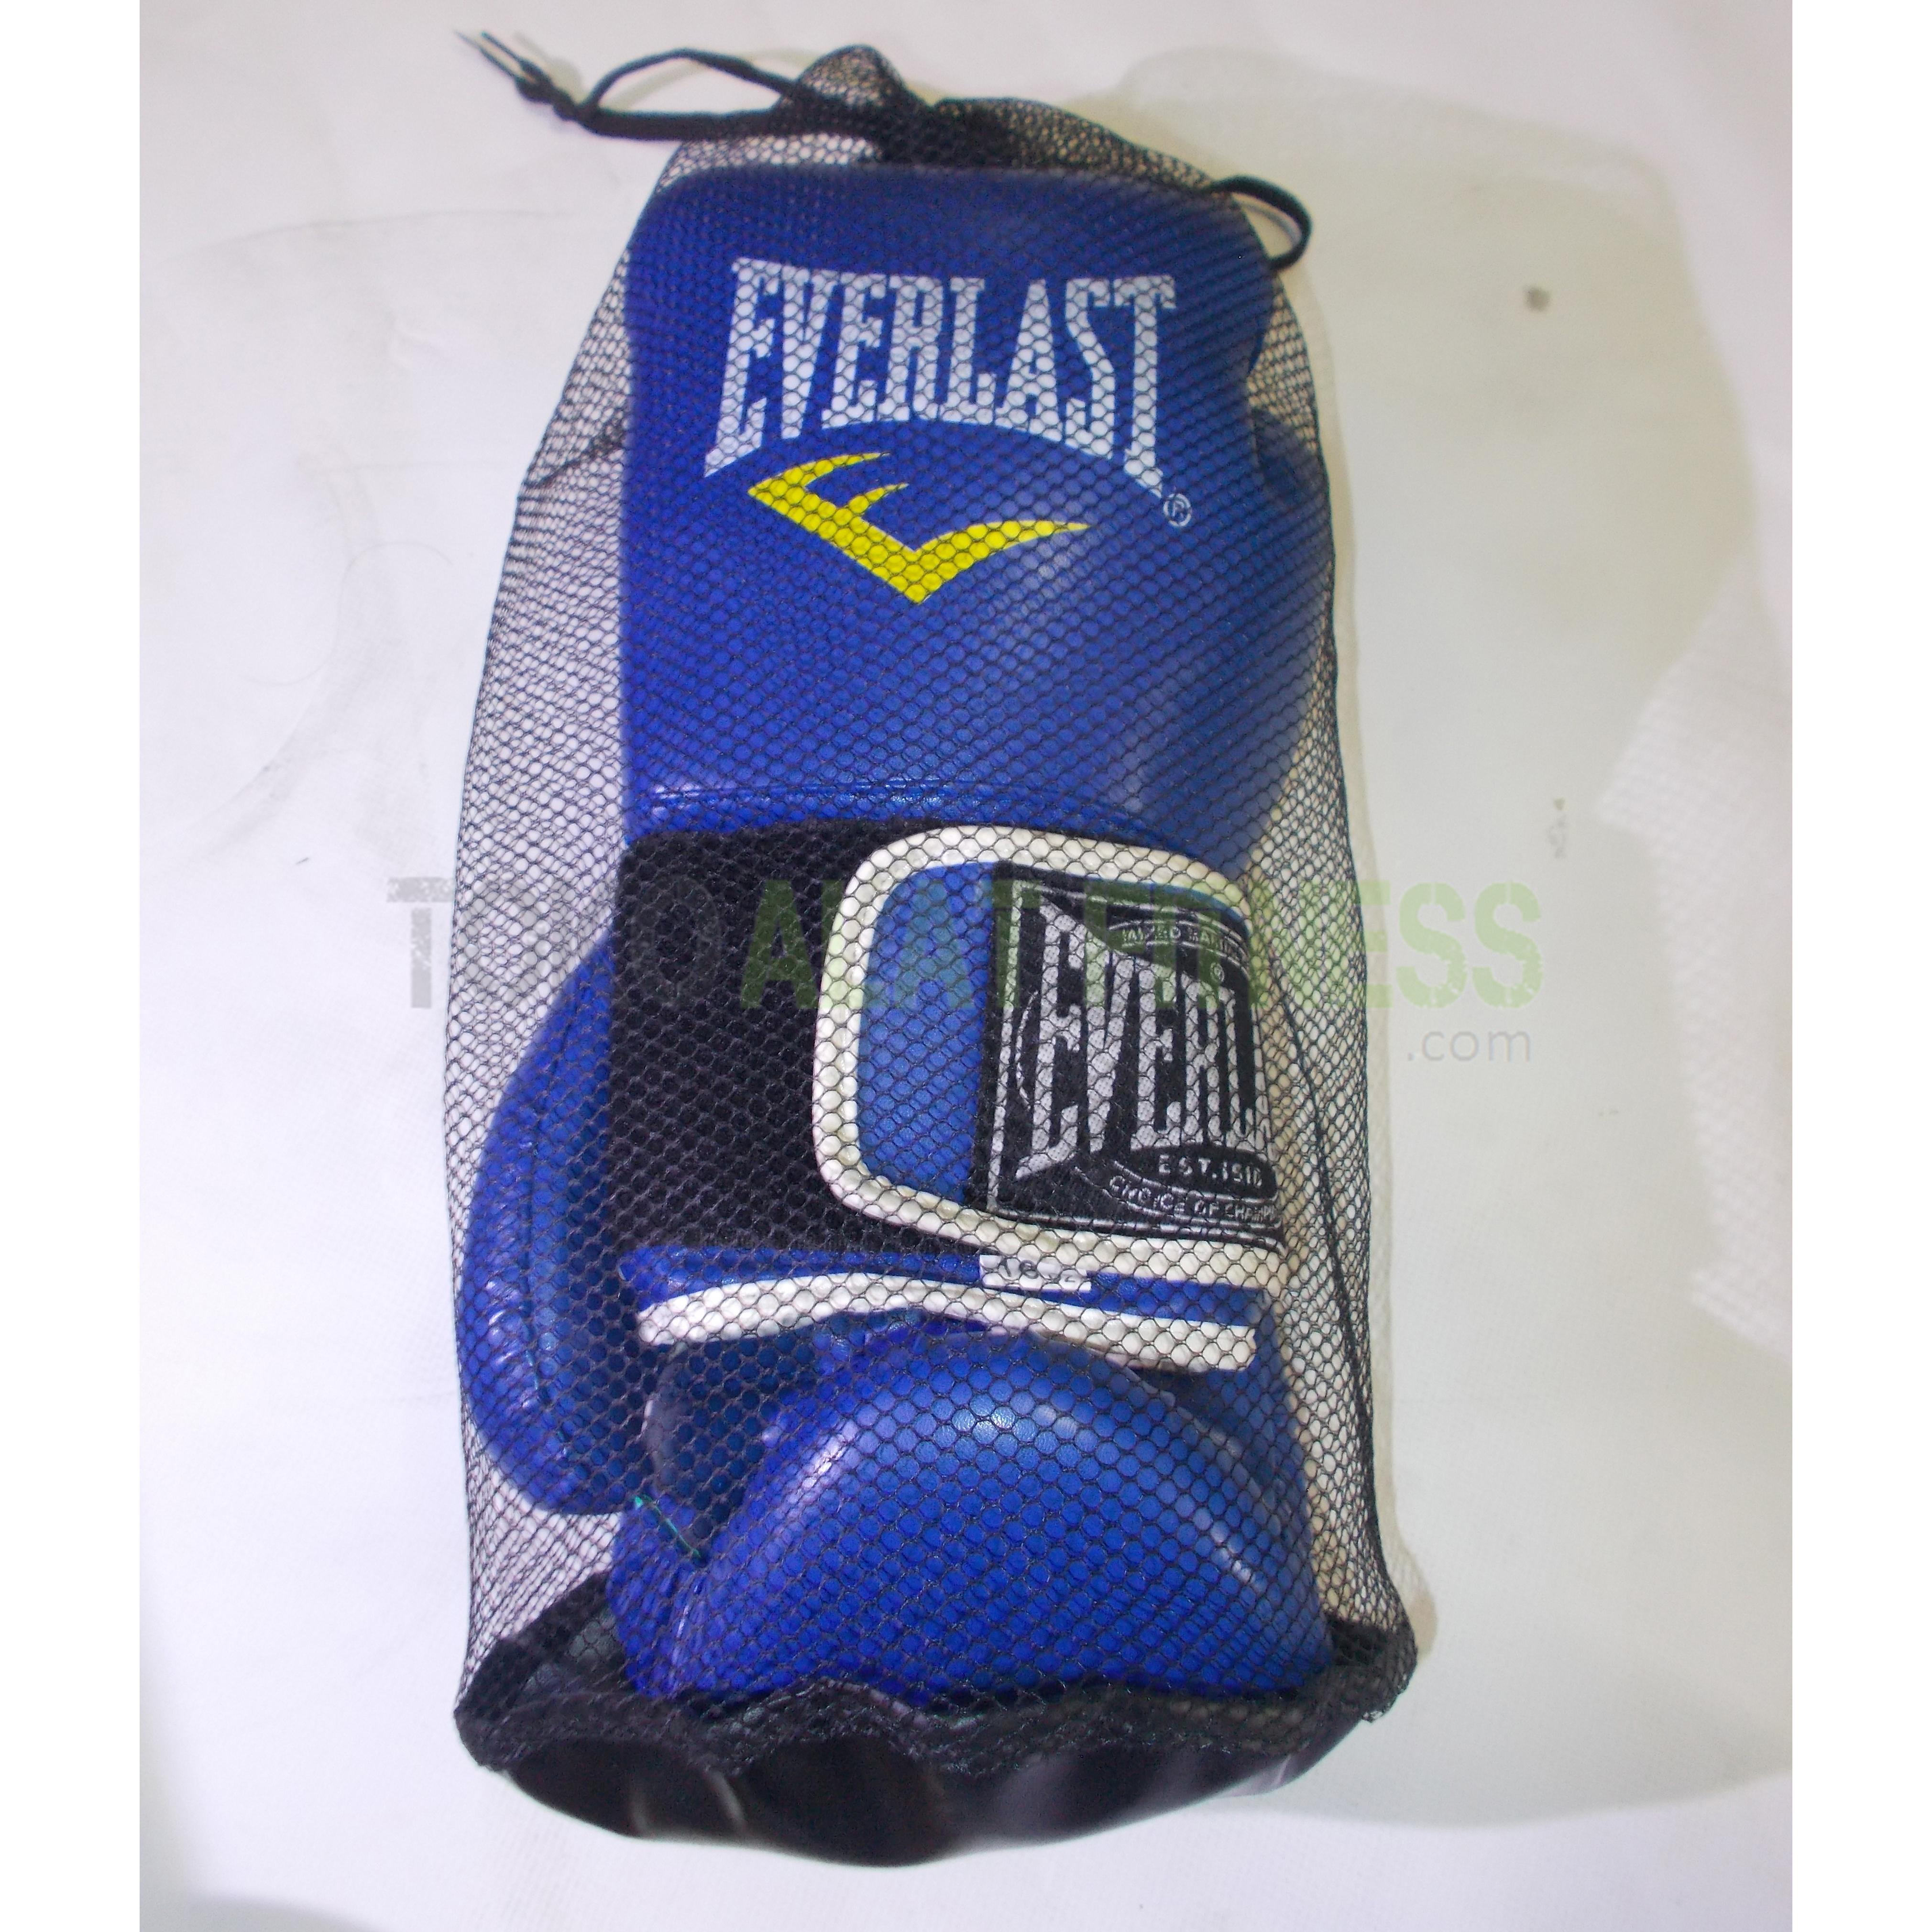 Sarung tinju everlast biru new 4 wtm - Sarung Tinju/Boxing Glove 10 OZ (biru) Everlast